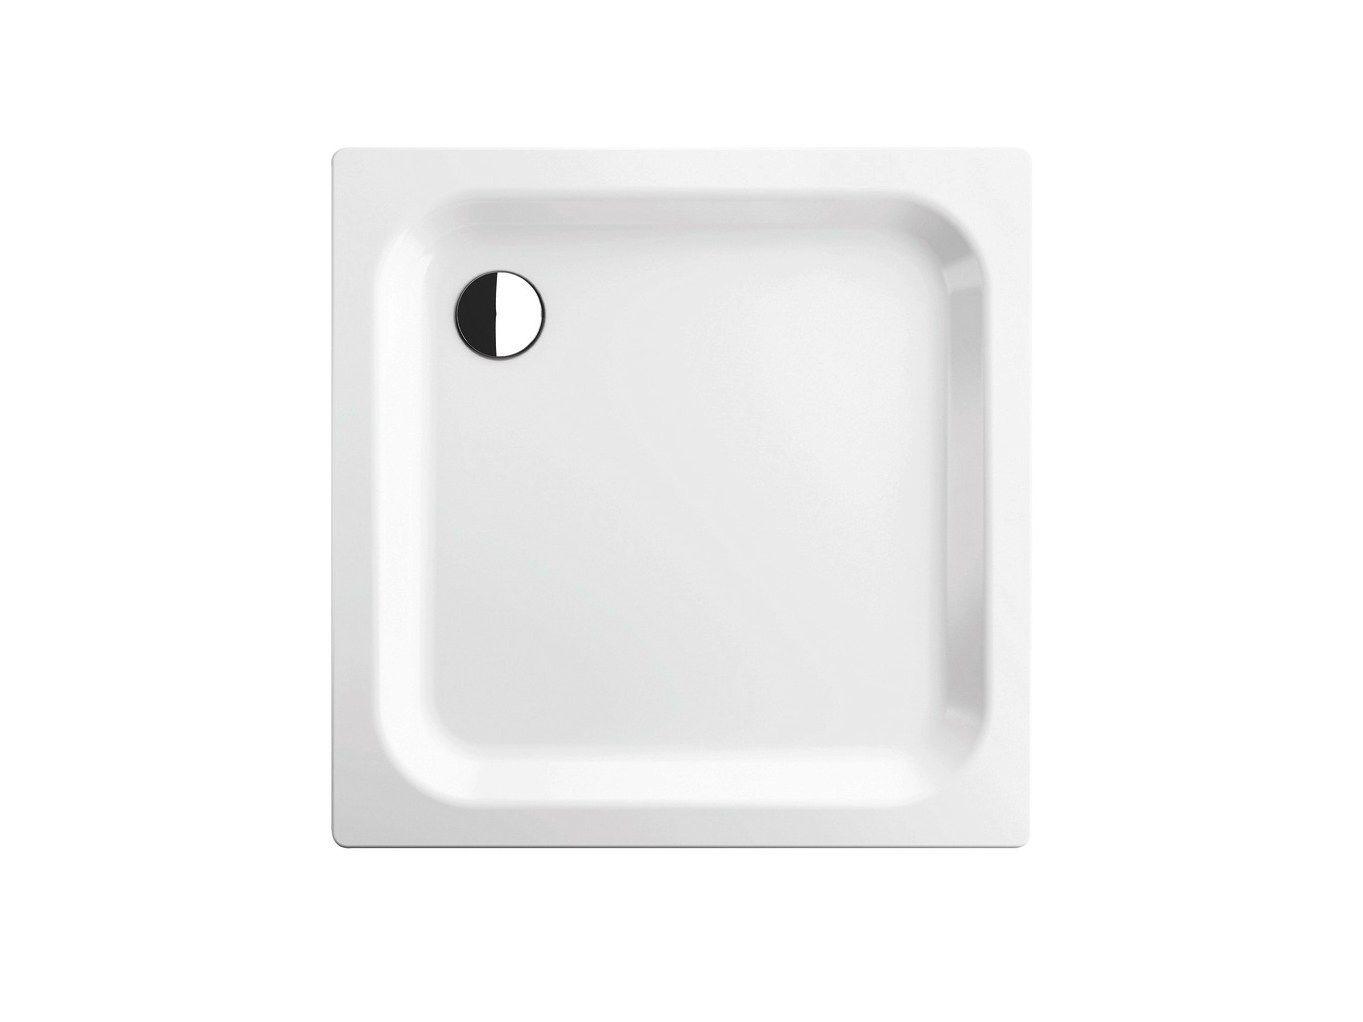 extraflach quadratische duschwanne by bette. Black Bedroom Furniture Sets. Home Design Ideas